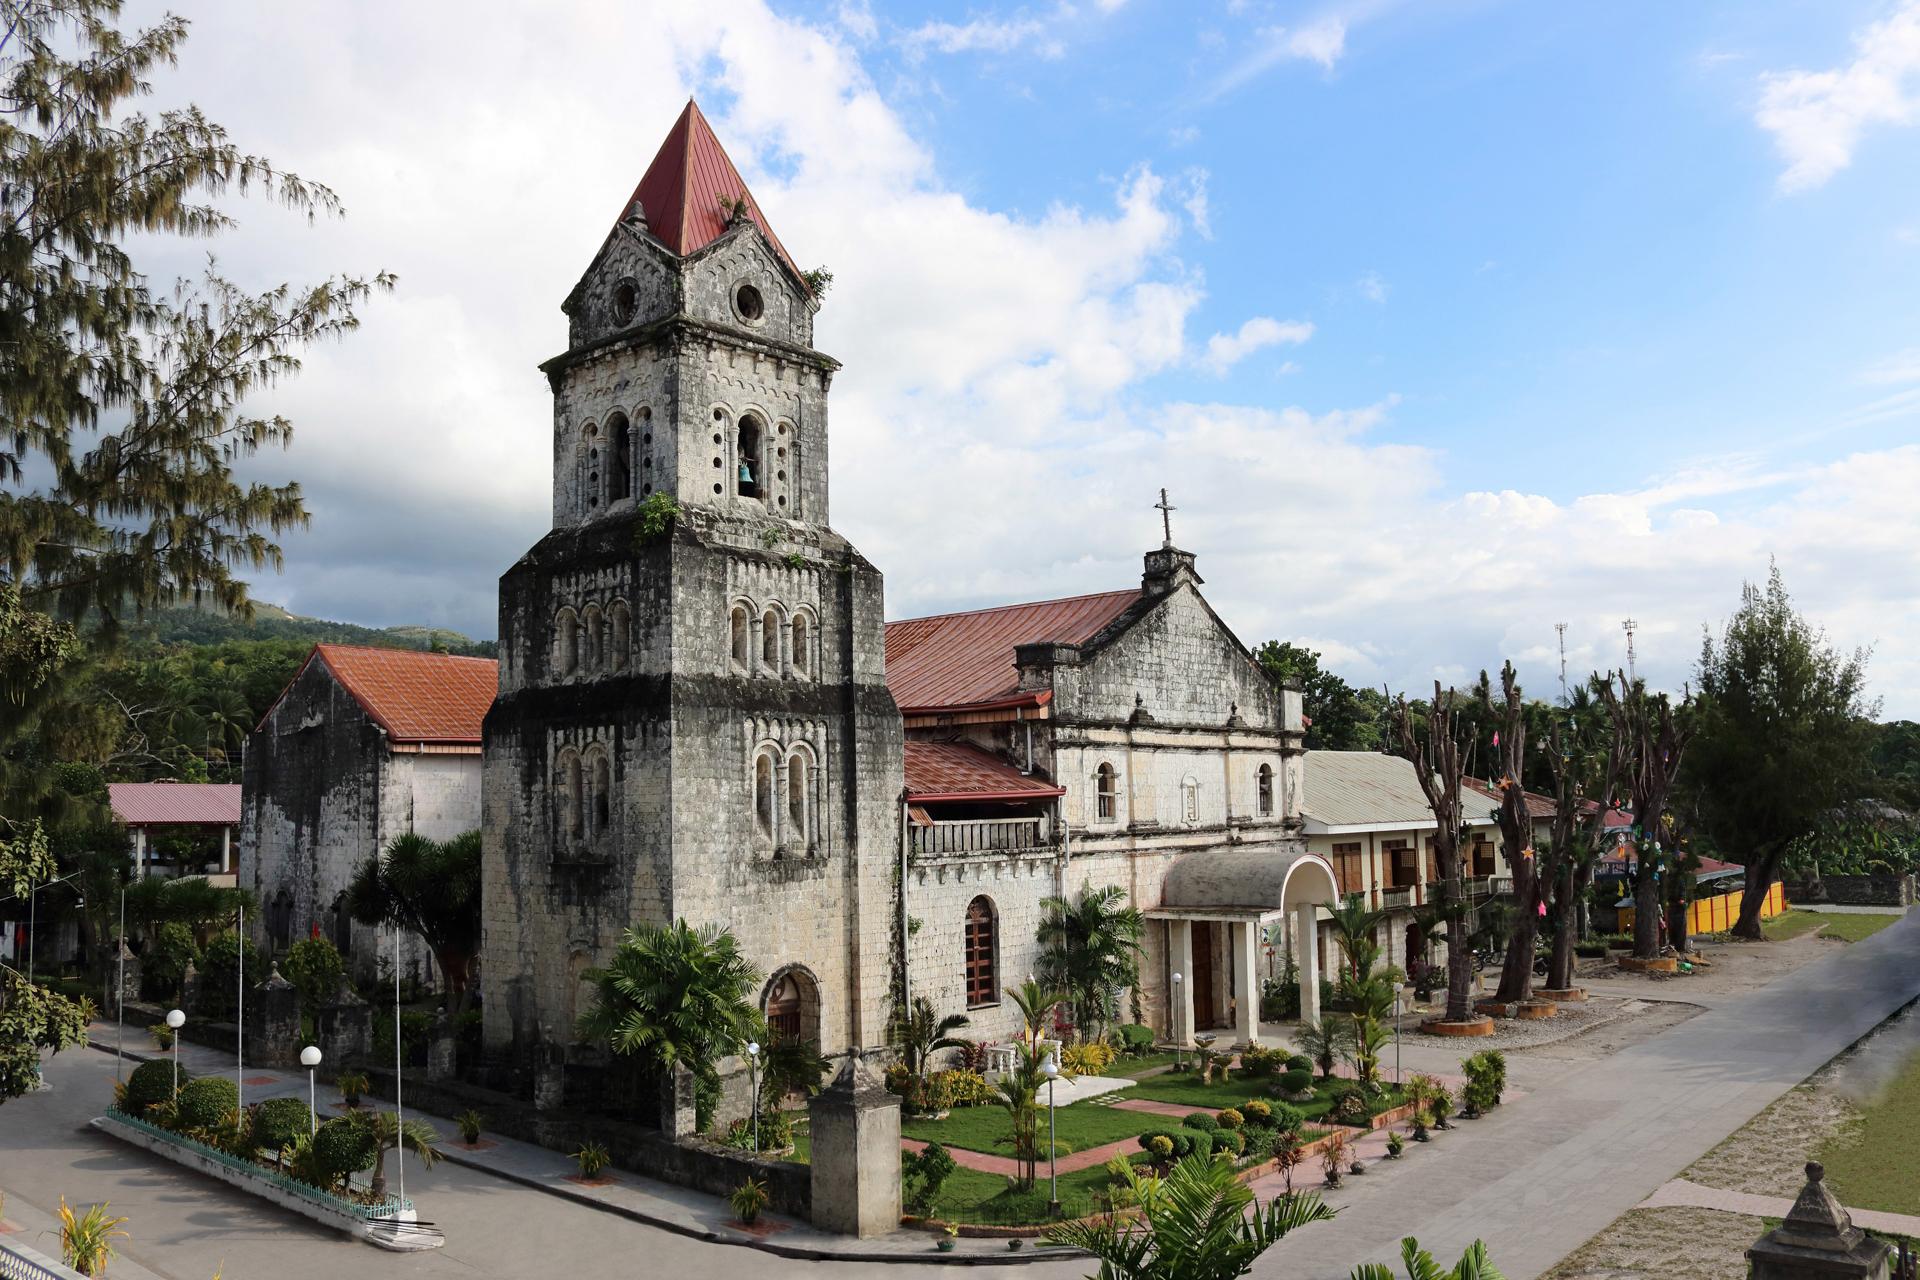 San Gregorio Magno Parish Church. Photo from tourism.ginatilancebu